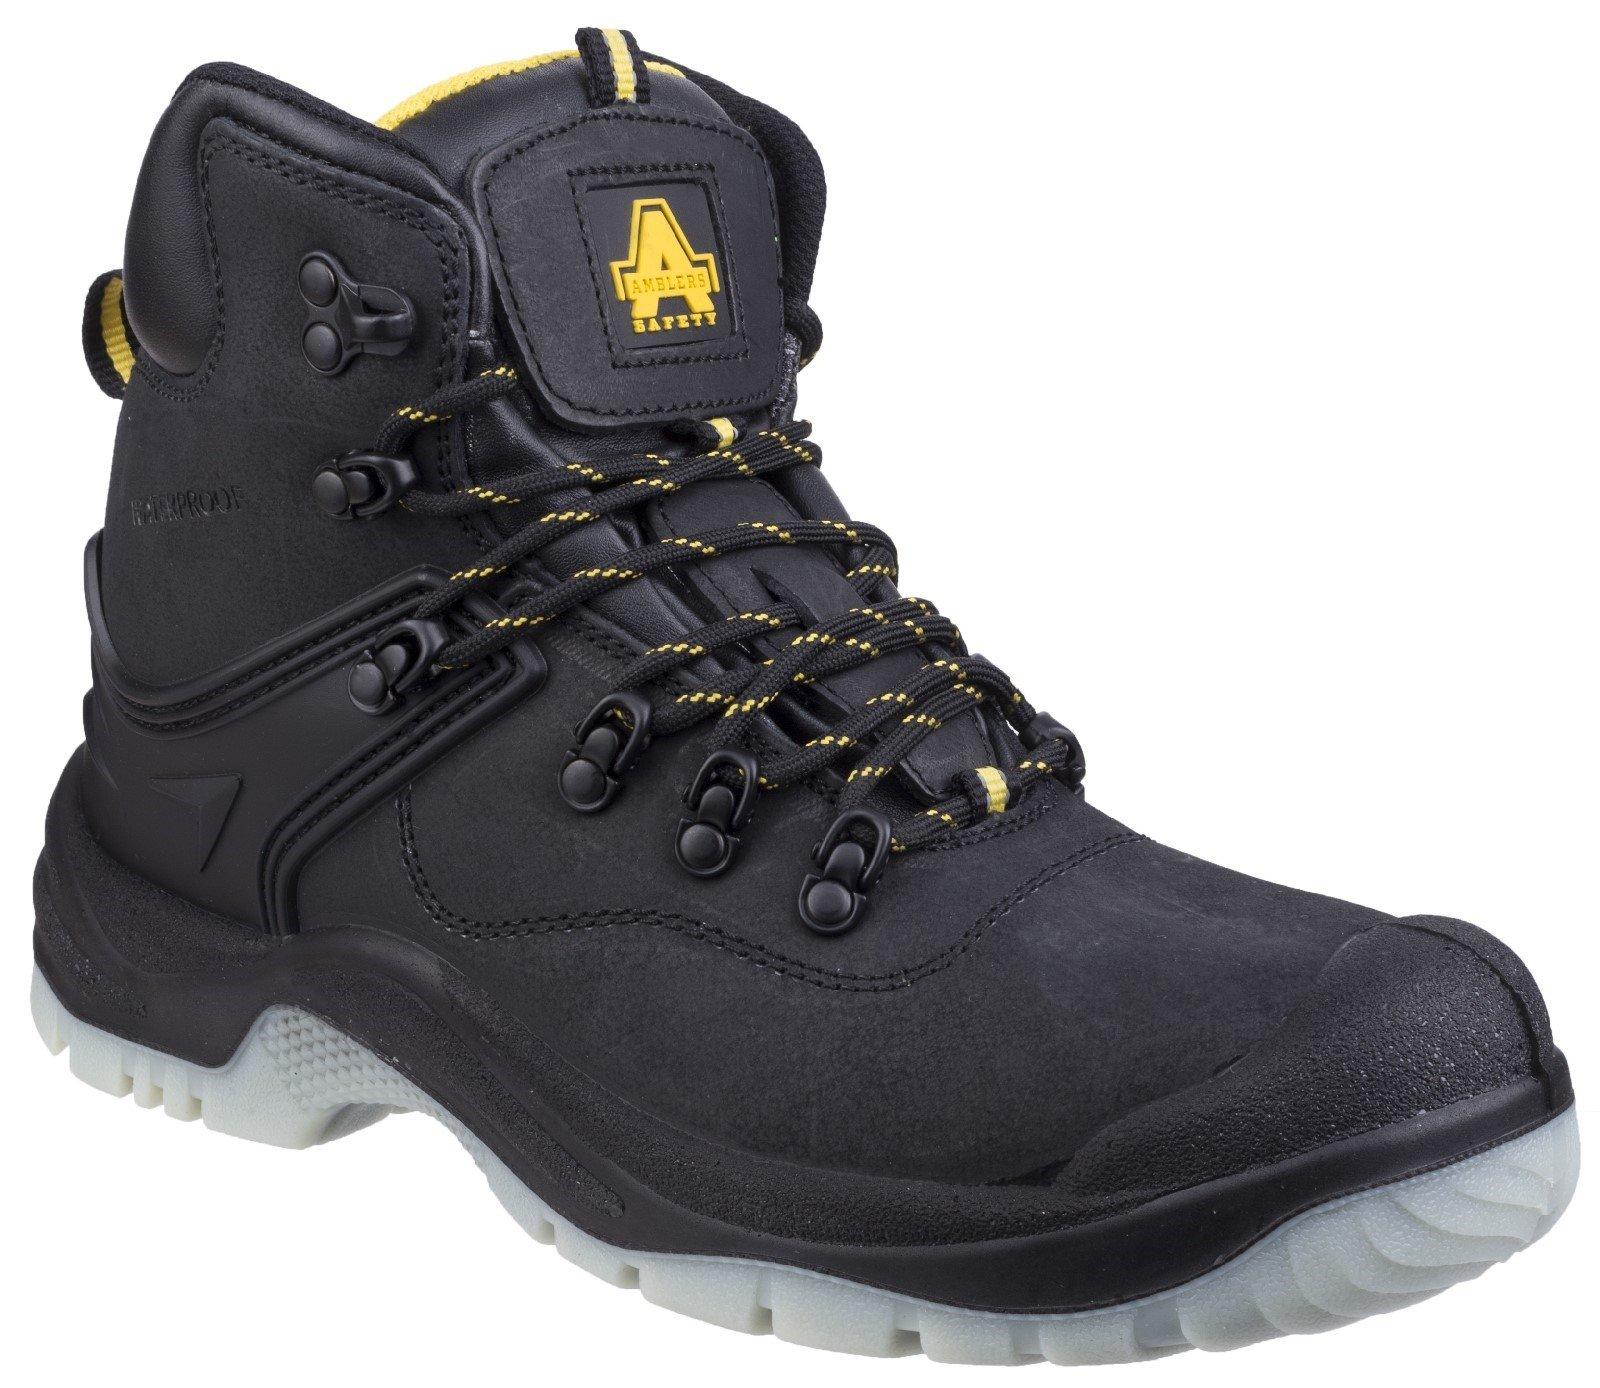 Amblers Unisex Safety Boot Black 24882 - Black 4